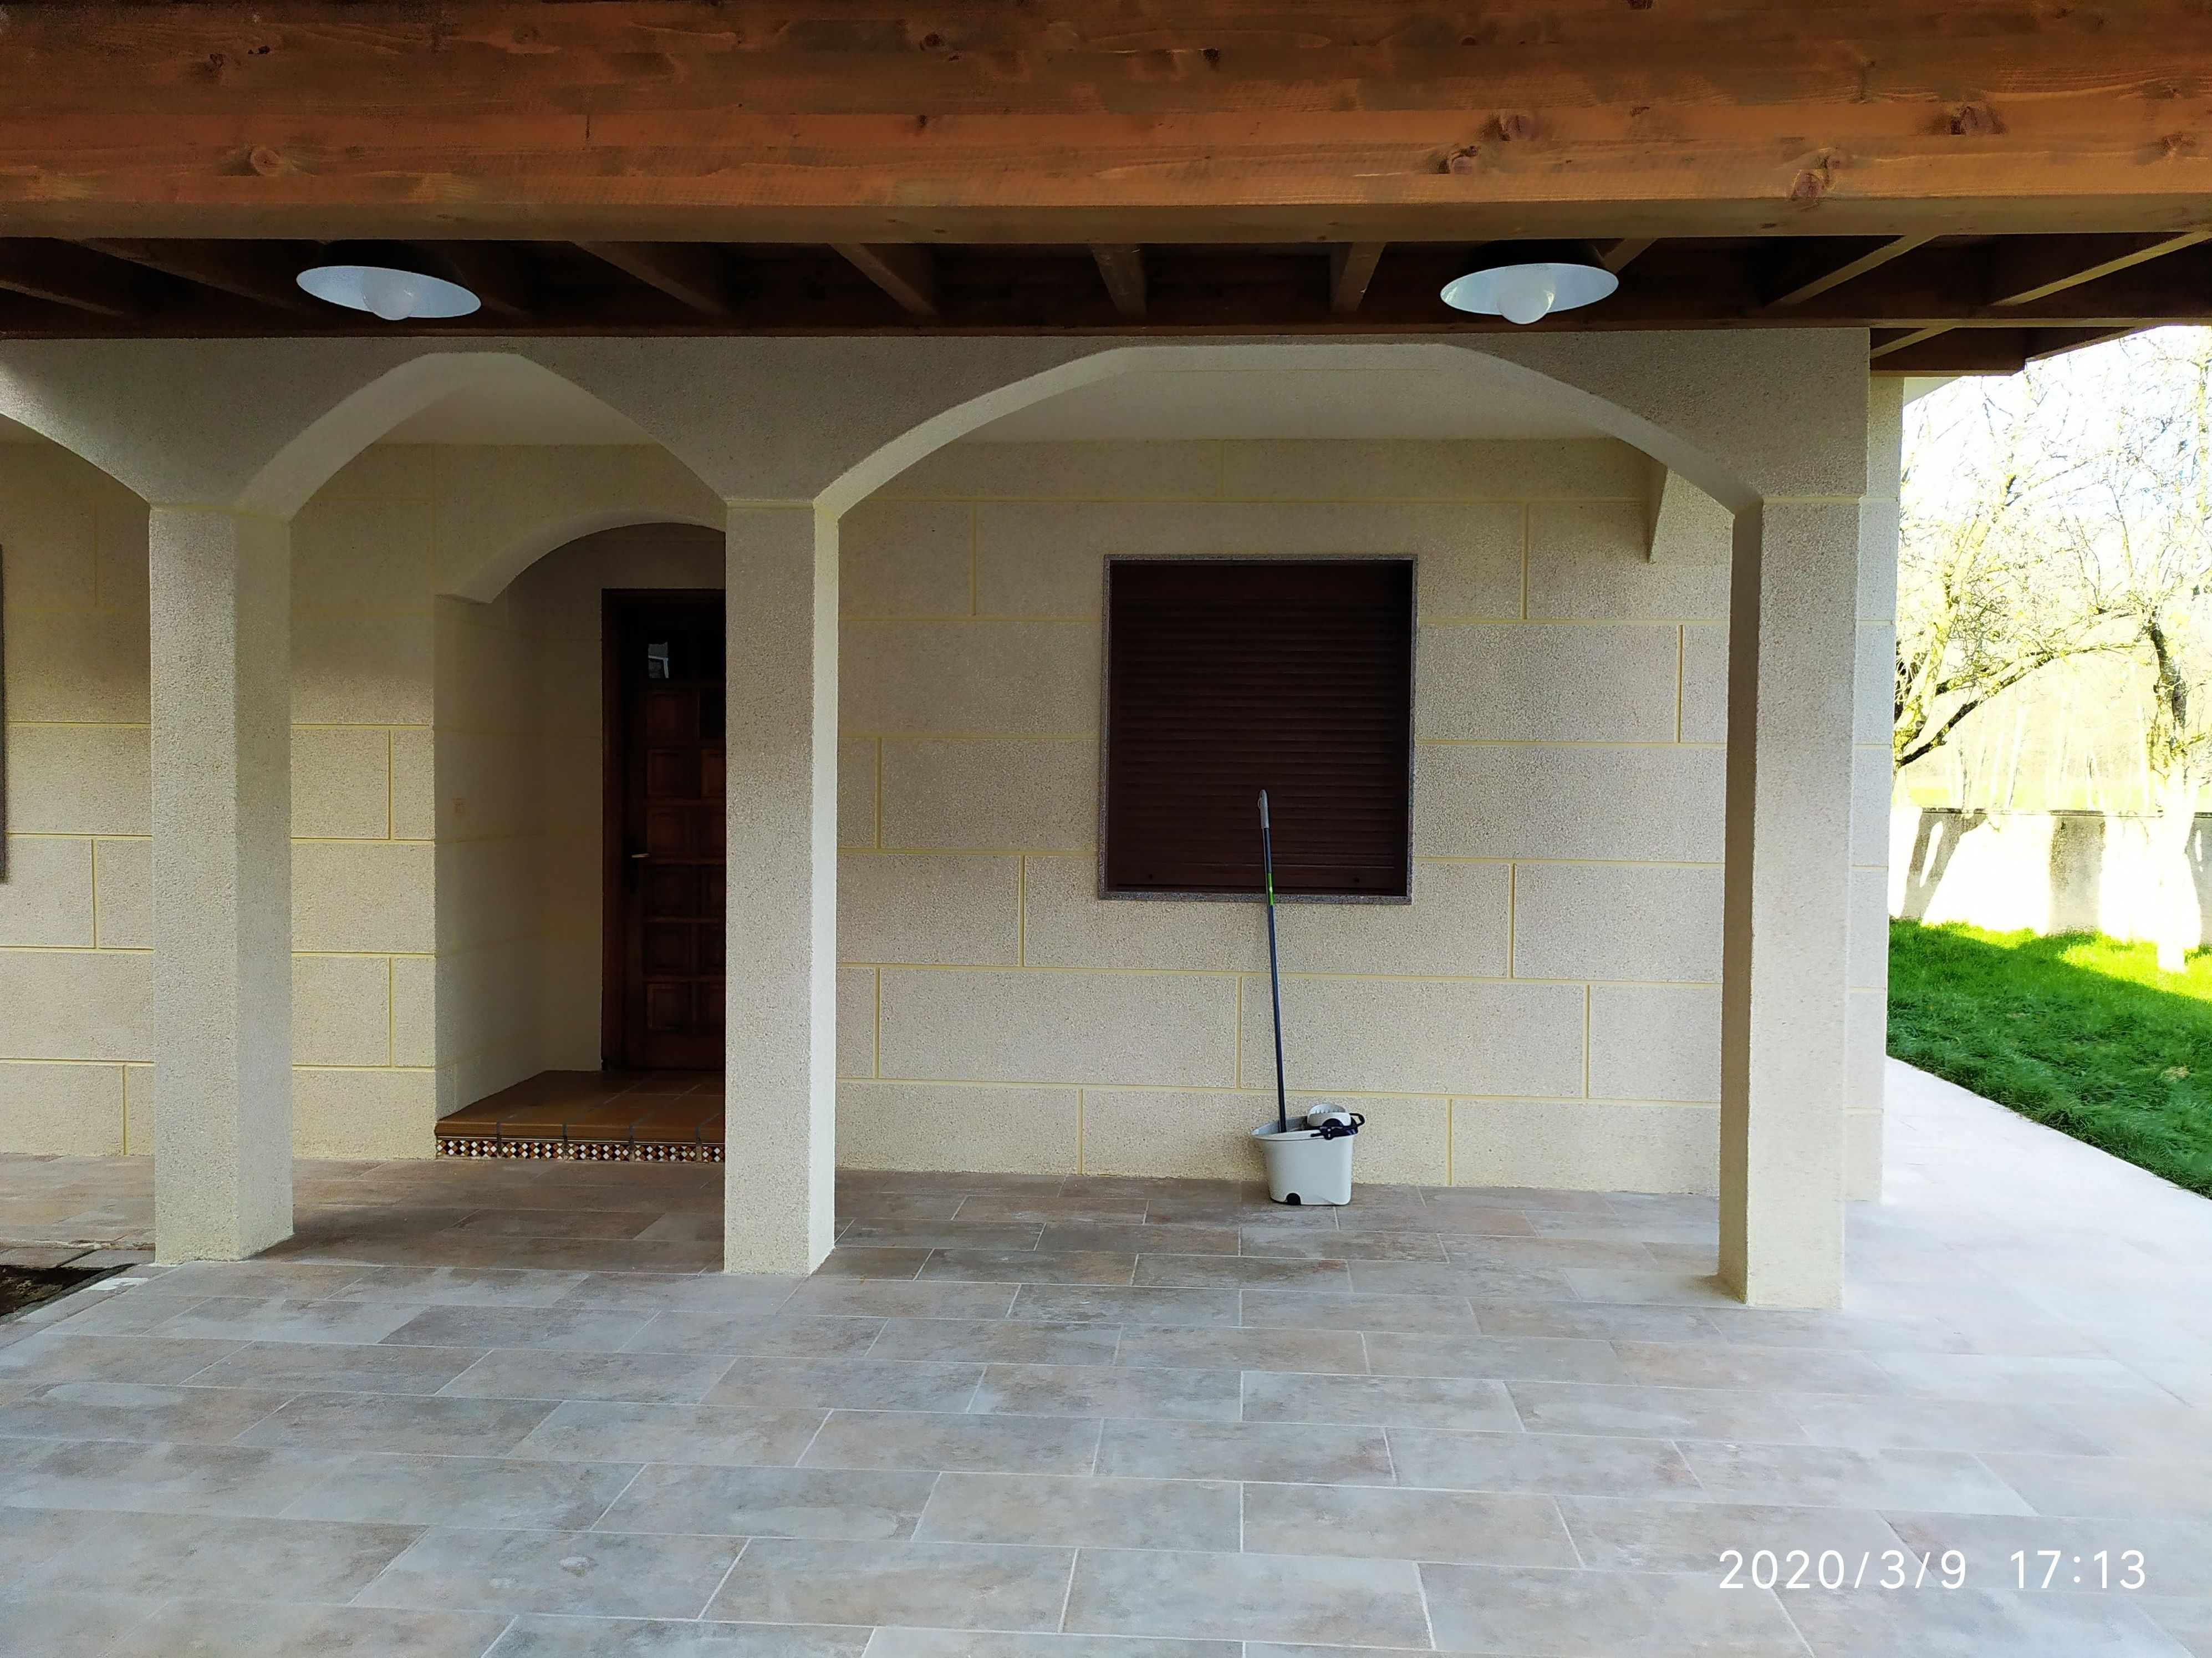 Fachadas realizada en monocapa acabado arido proyectado en despiece piedra